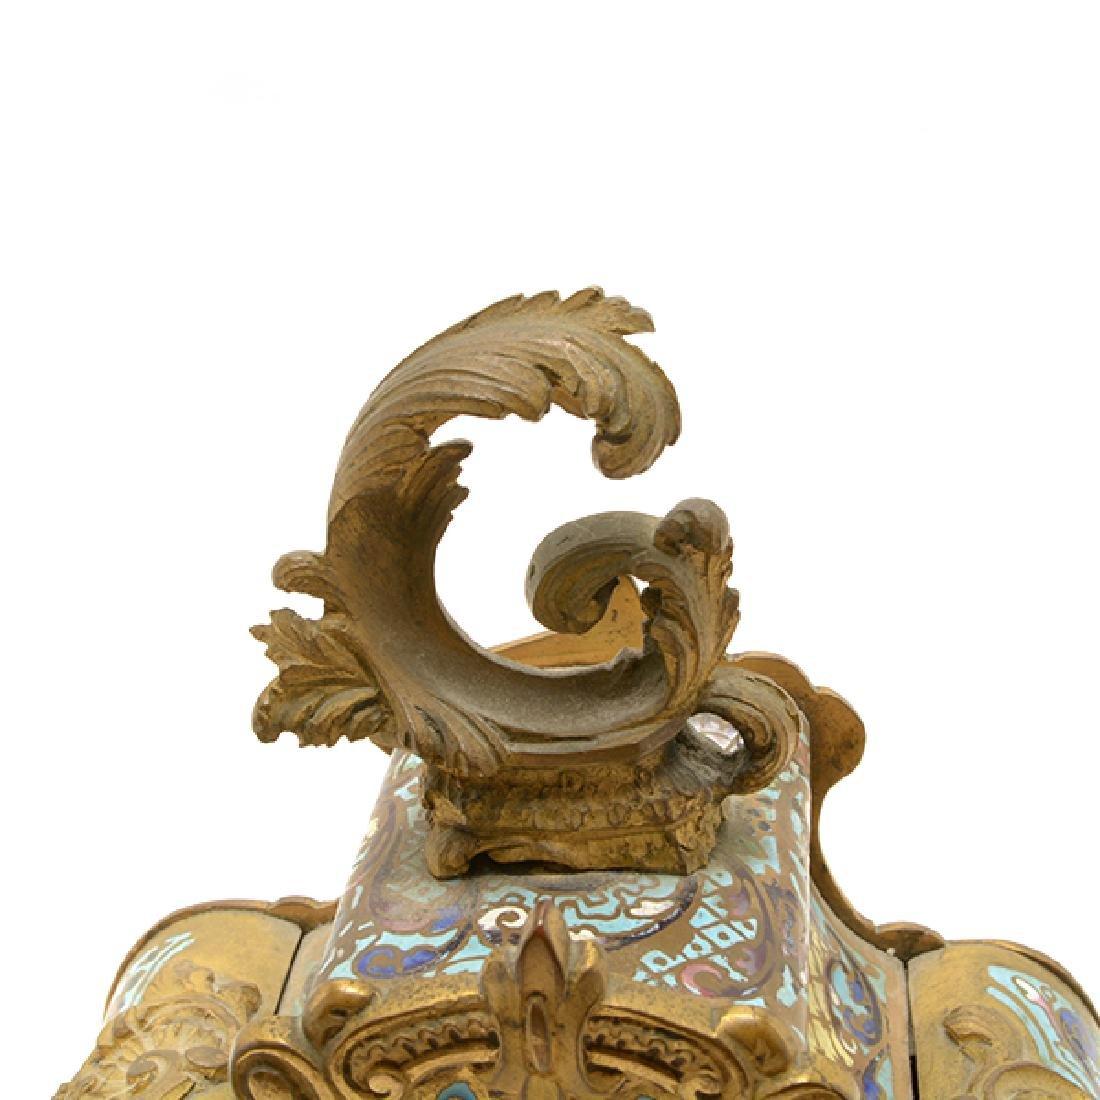 Louis XV Gilt Bronze Champleve Enamel Mantel Clock - 7